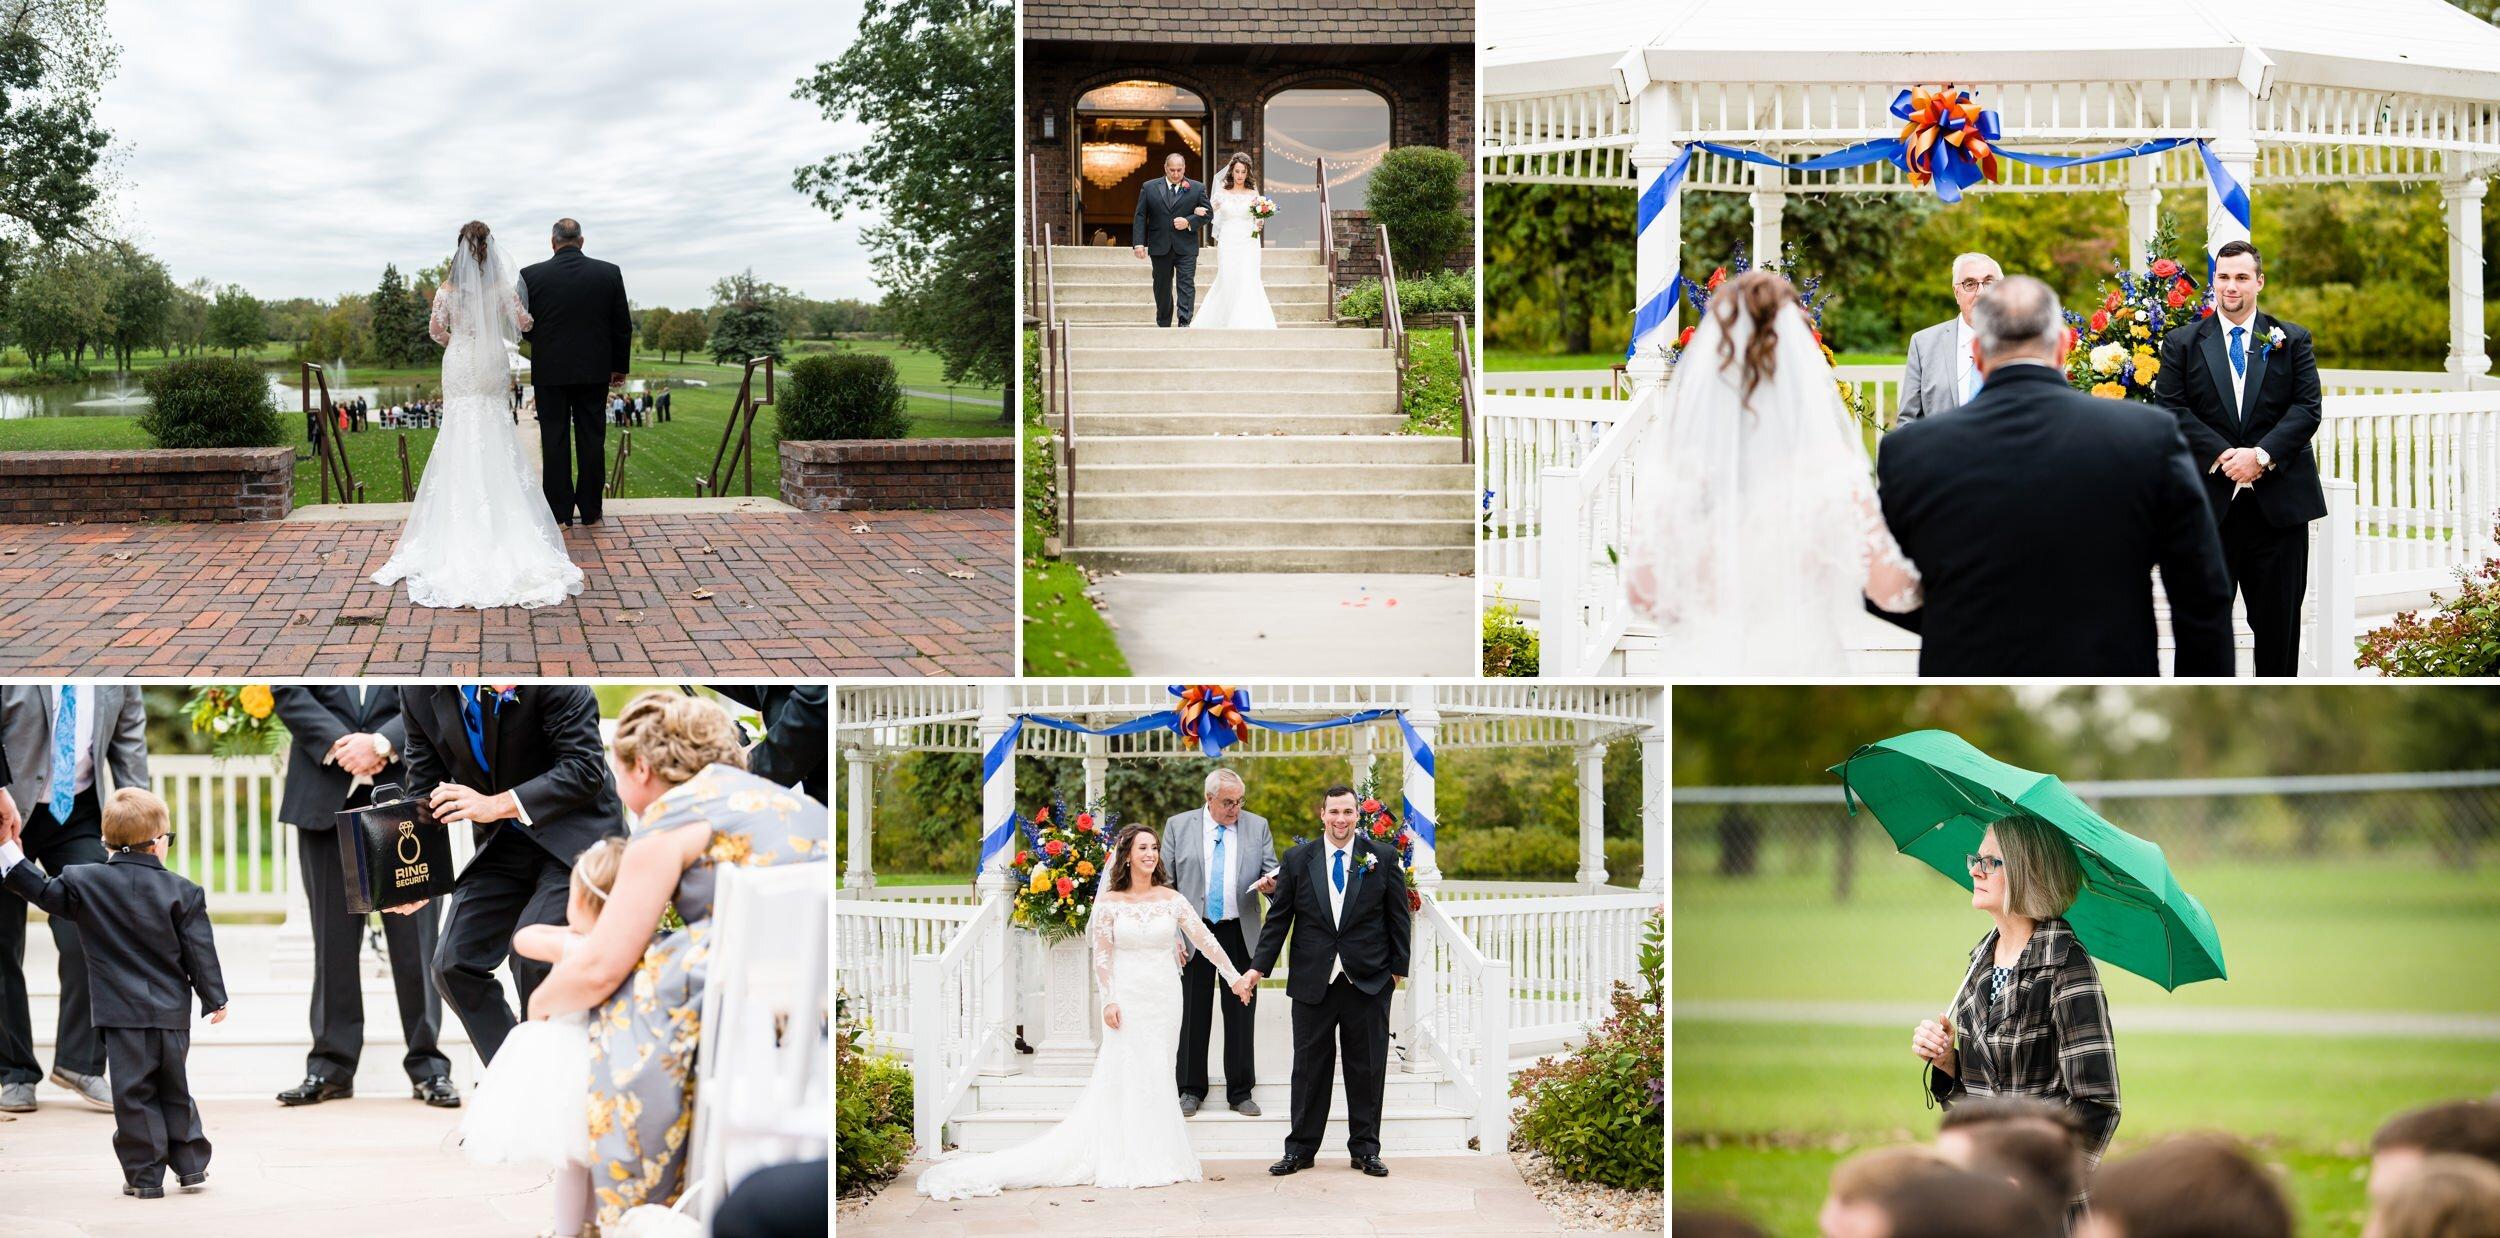 Outdoor Fall wedding at Wicker Park Social Center.